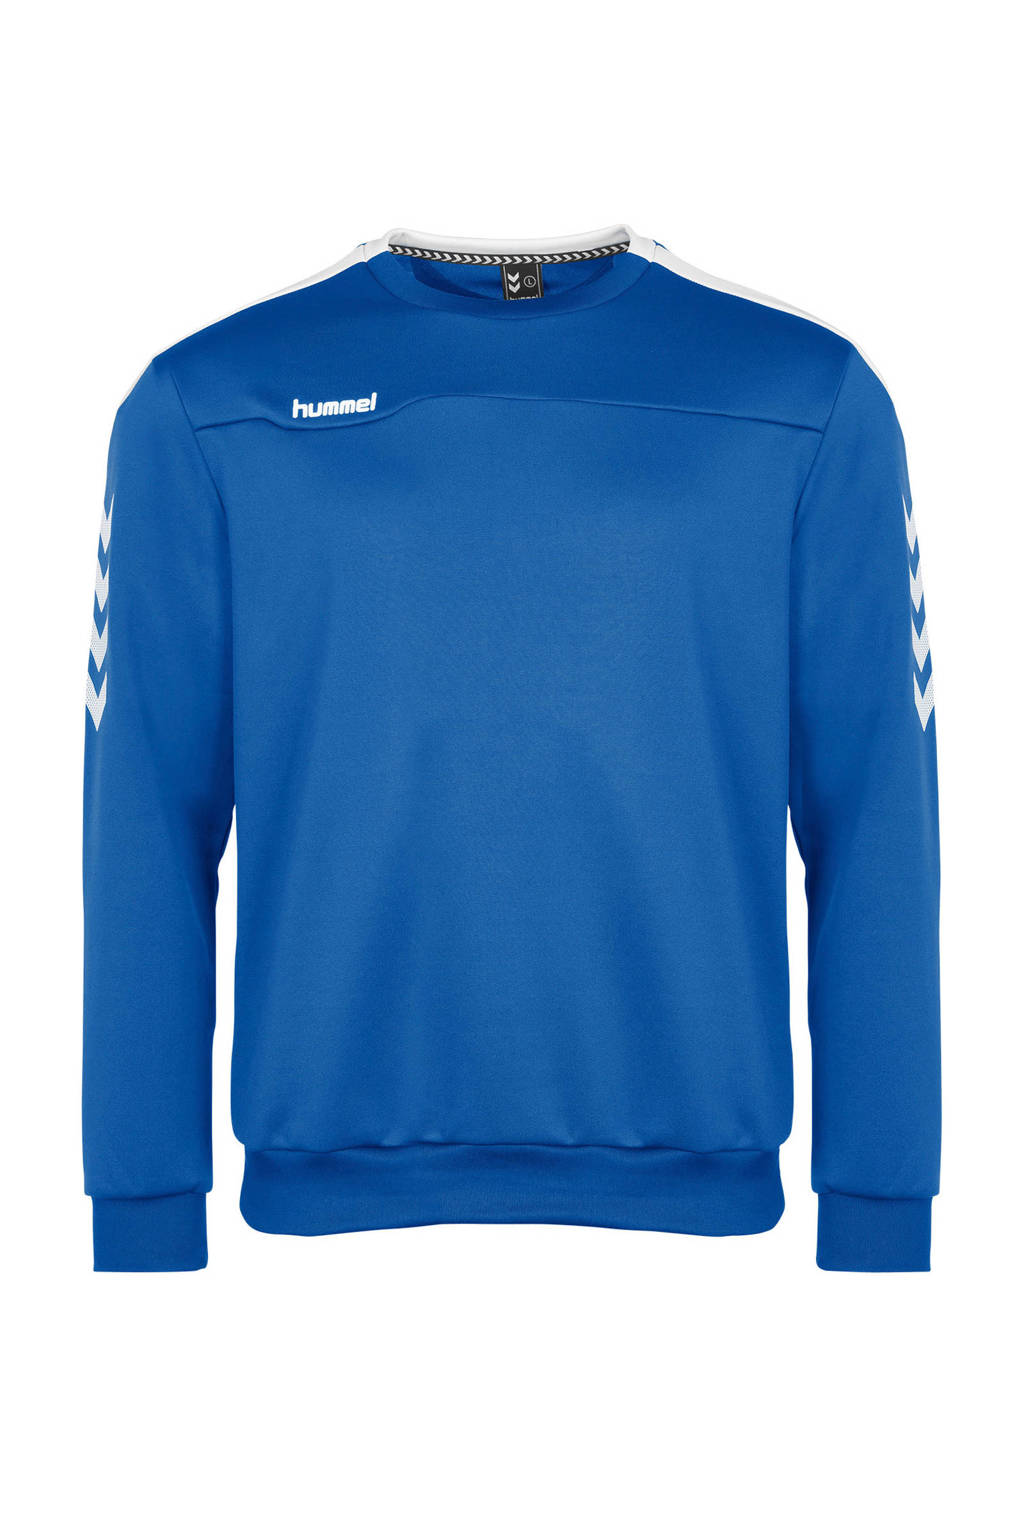 hummel   sportsweater blauw, Blauw/wit, Heren